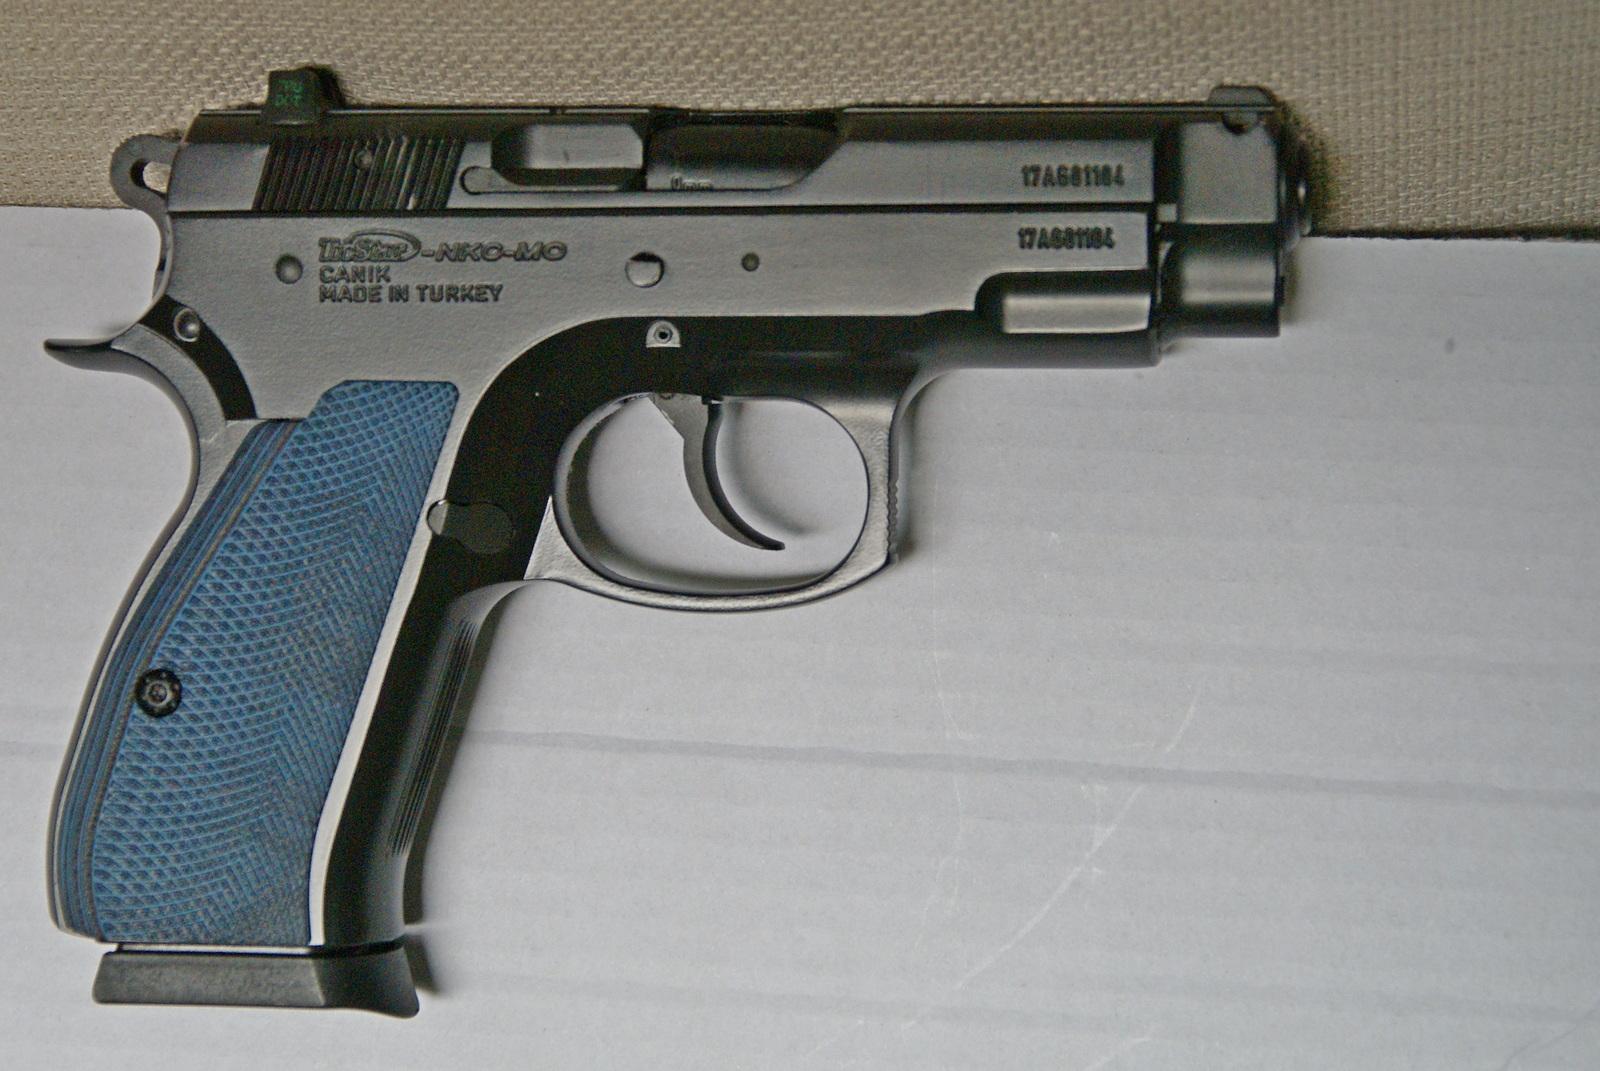 DSC08435-a.JPG